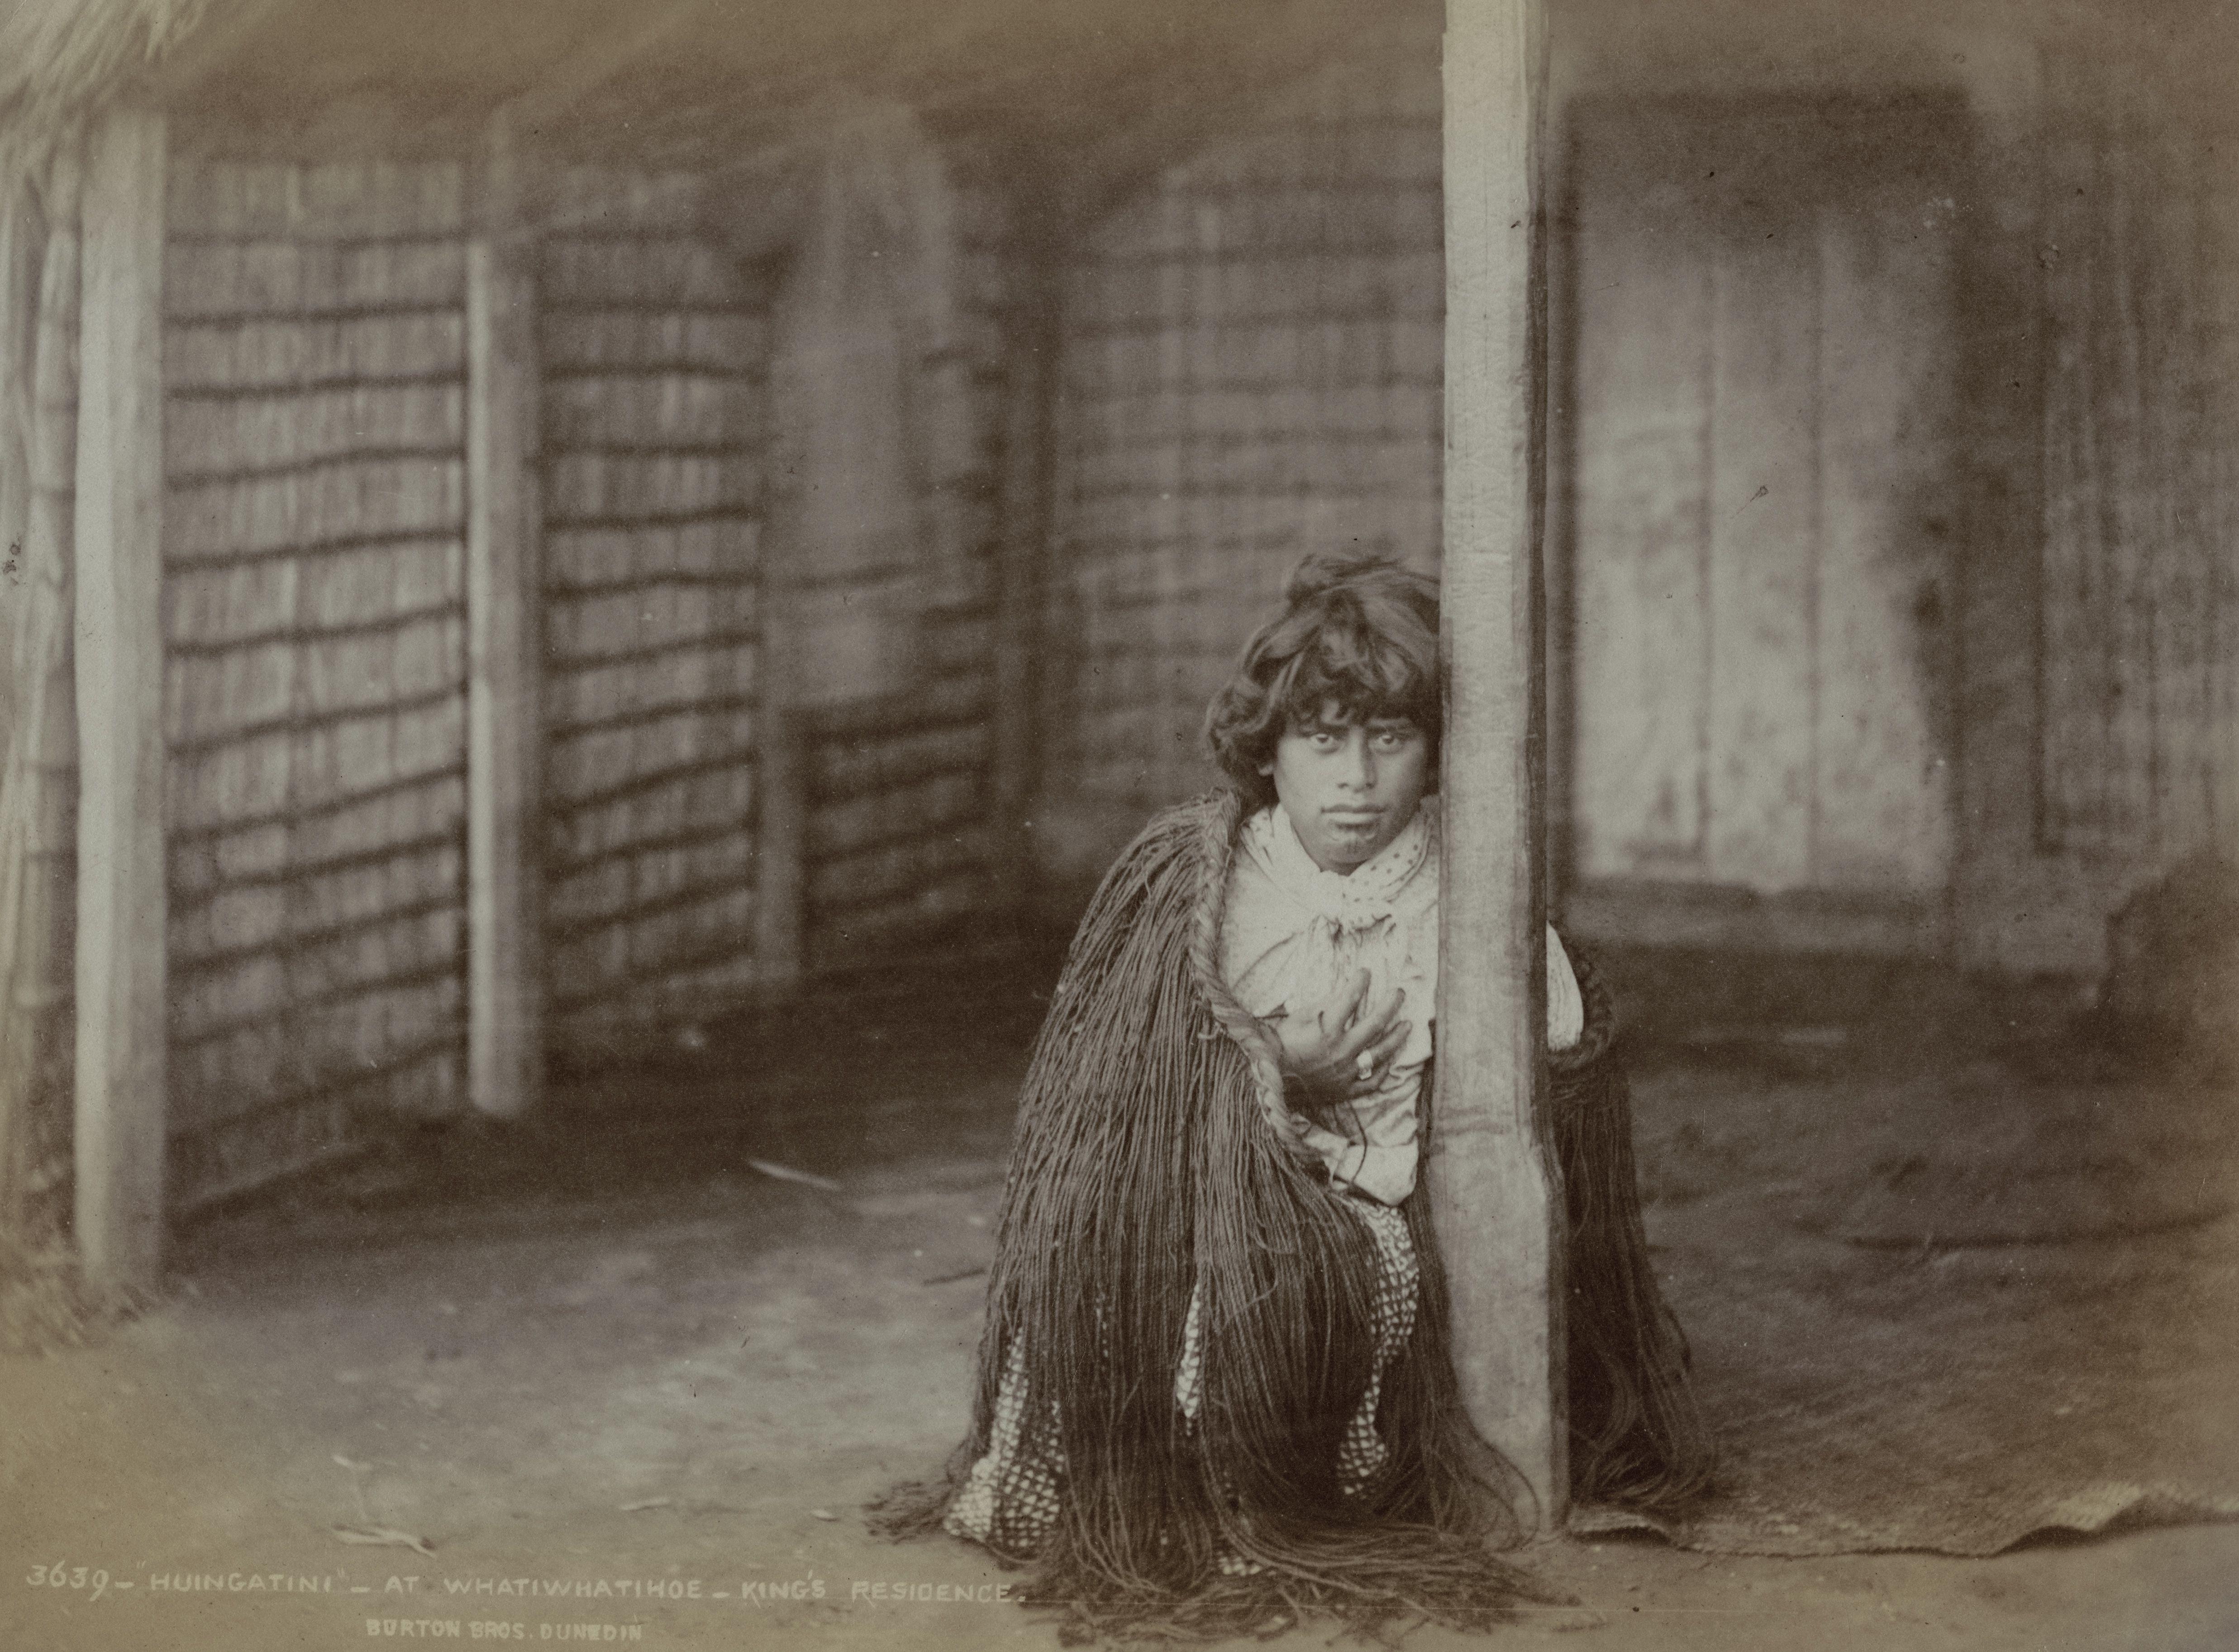 44 Captivating Native Maori Portraits From 19th Century New Zealand Flashbak Maori Tribe Maori Maori People